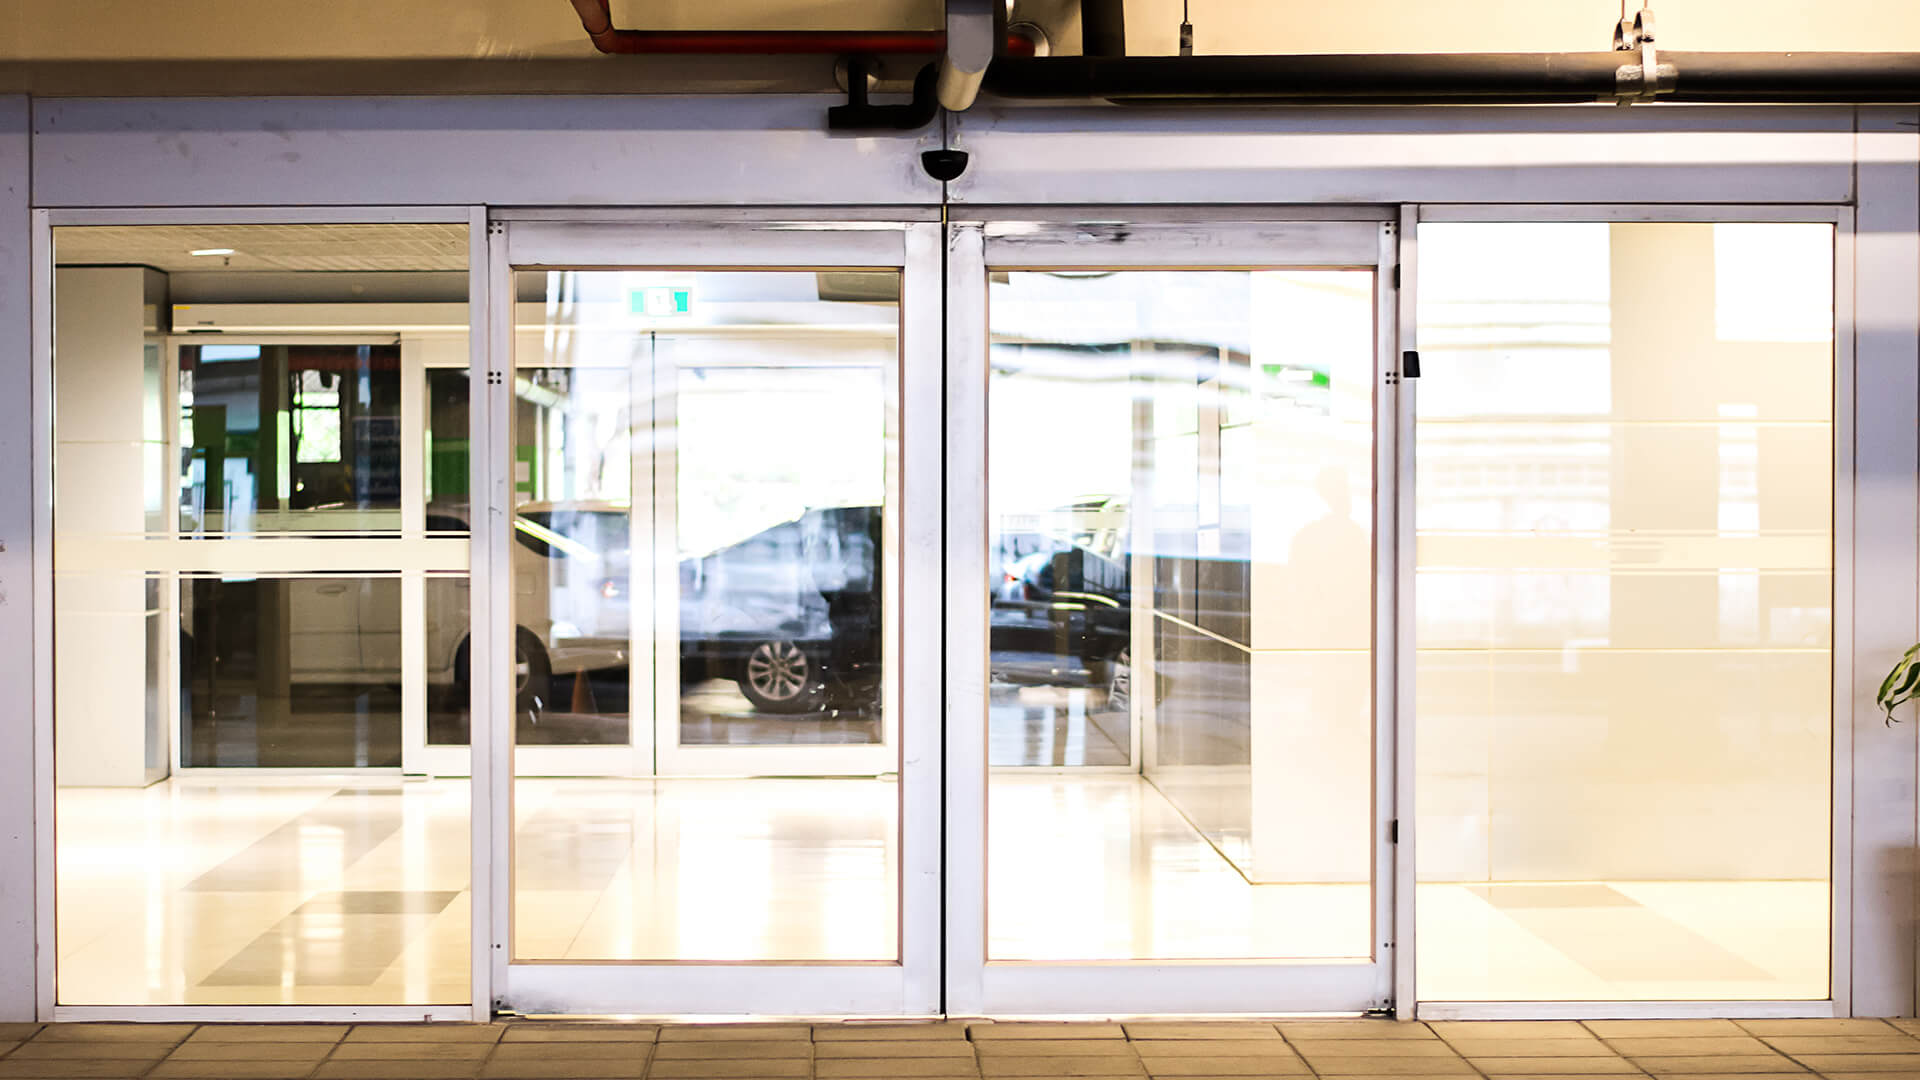 fotoselli kapi tamiri - Üretim, Satış, Montaj Hizmetleri